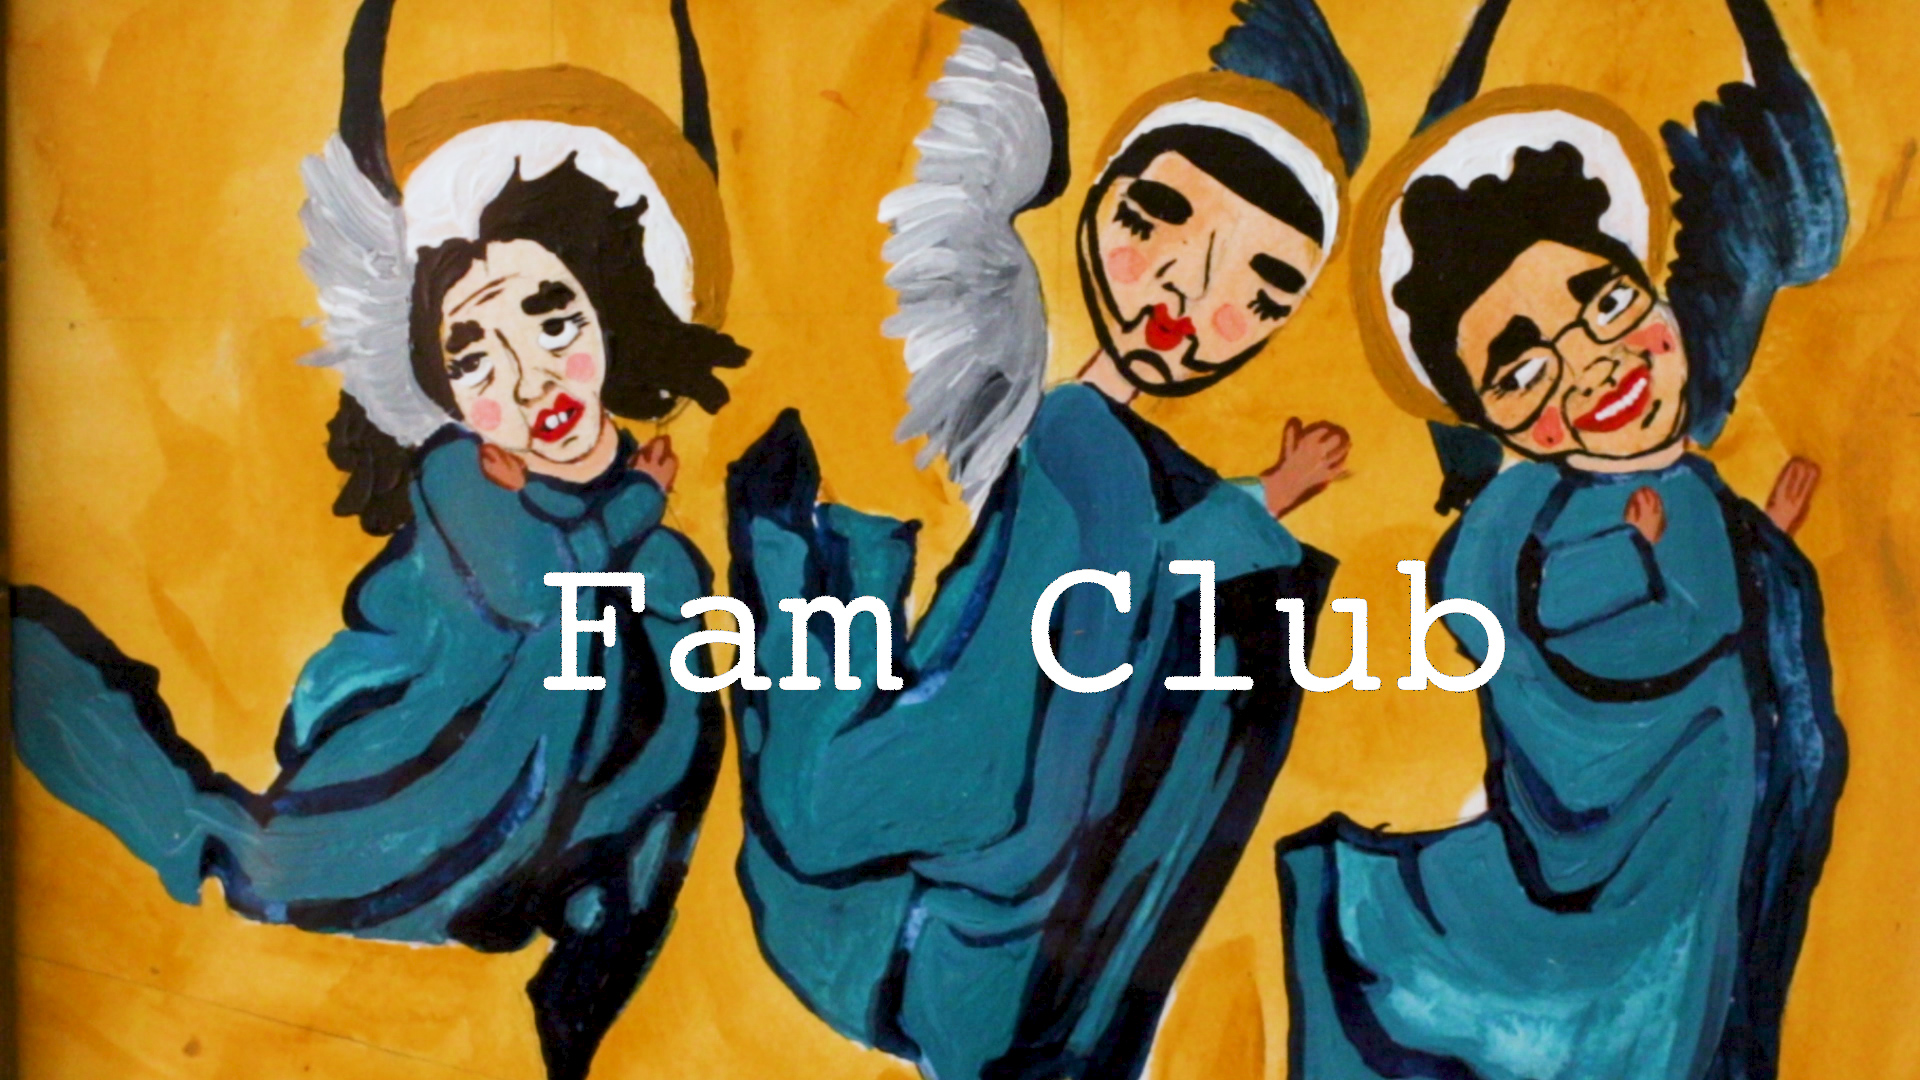 Fam Club